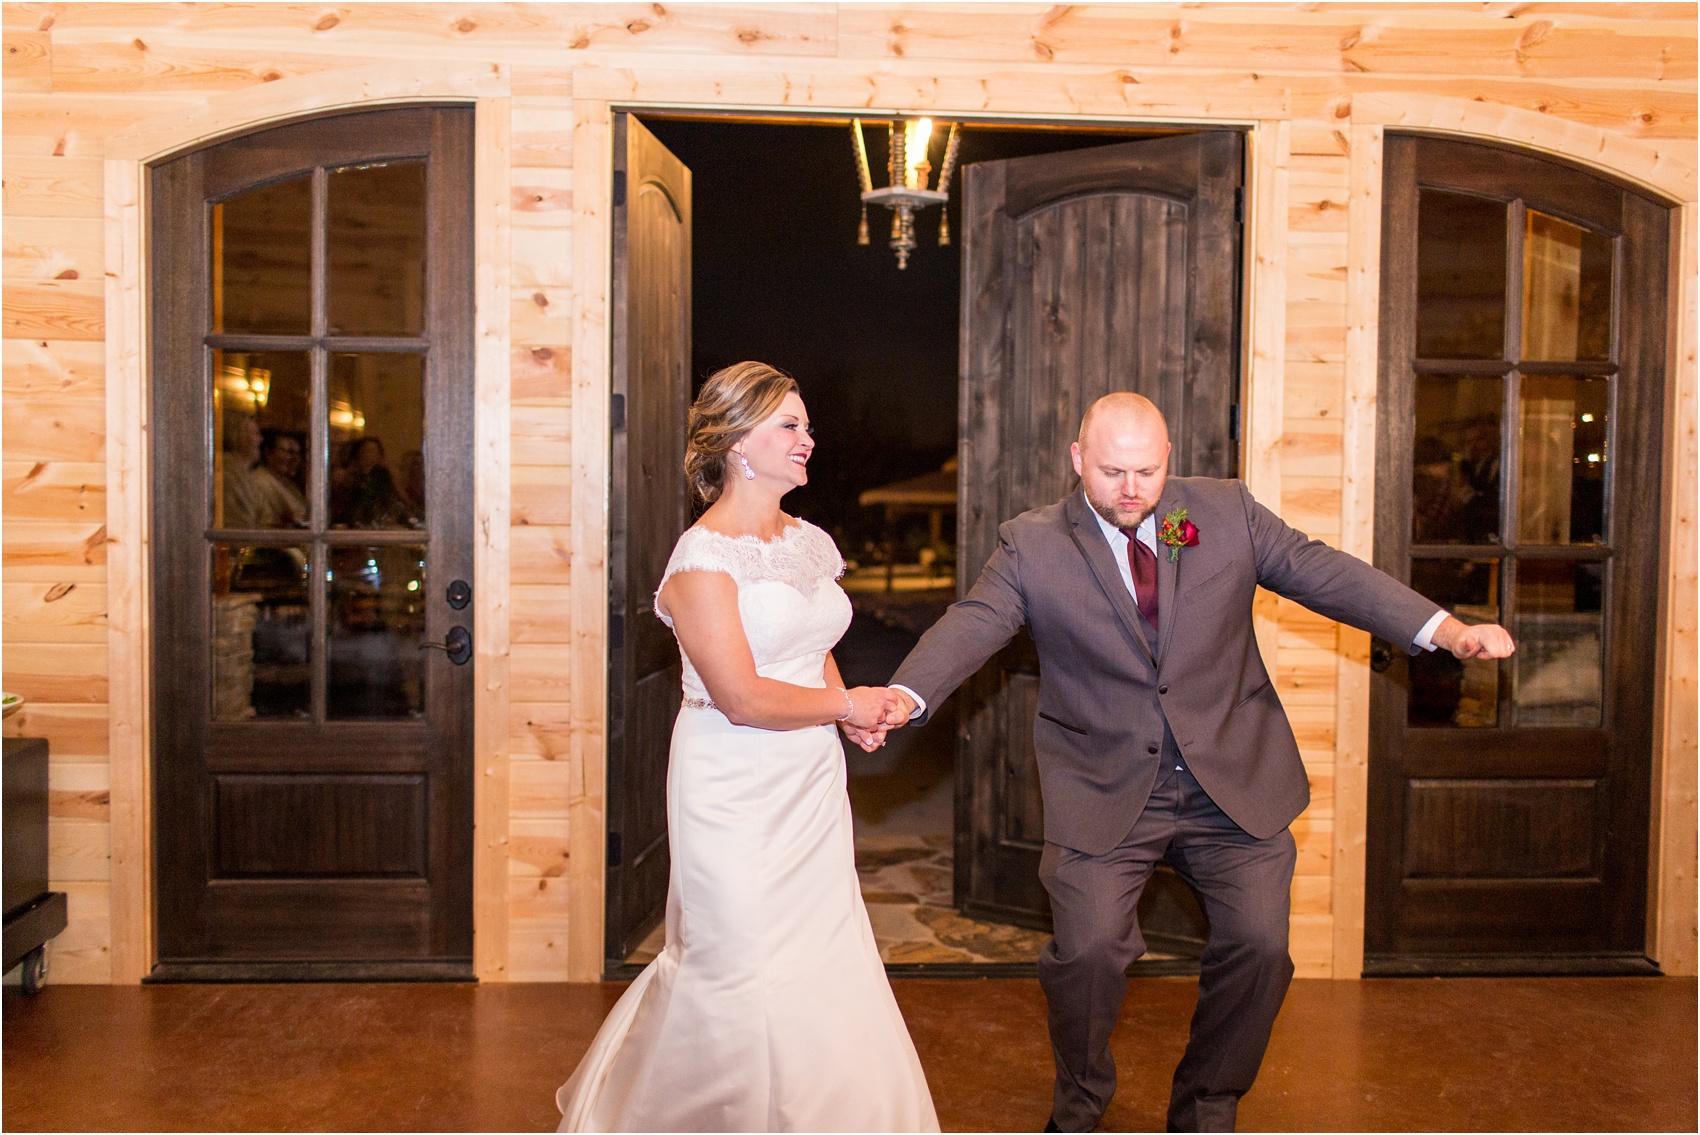 Savannah Eve Photography- Page Wedding Blog-79.jpg